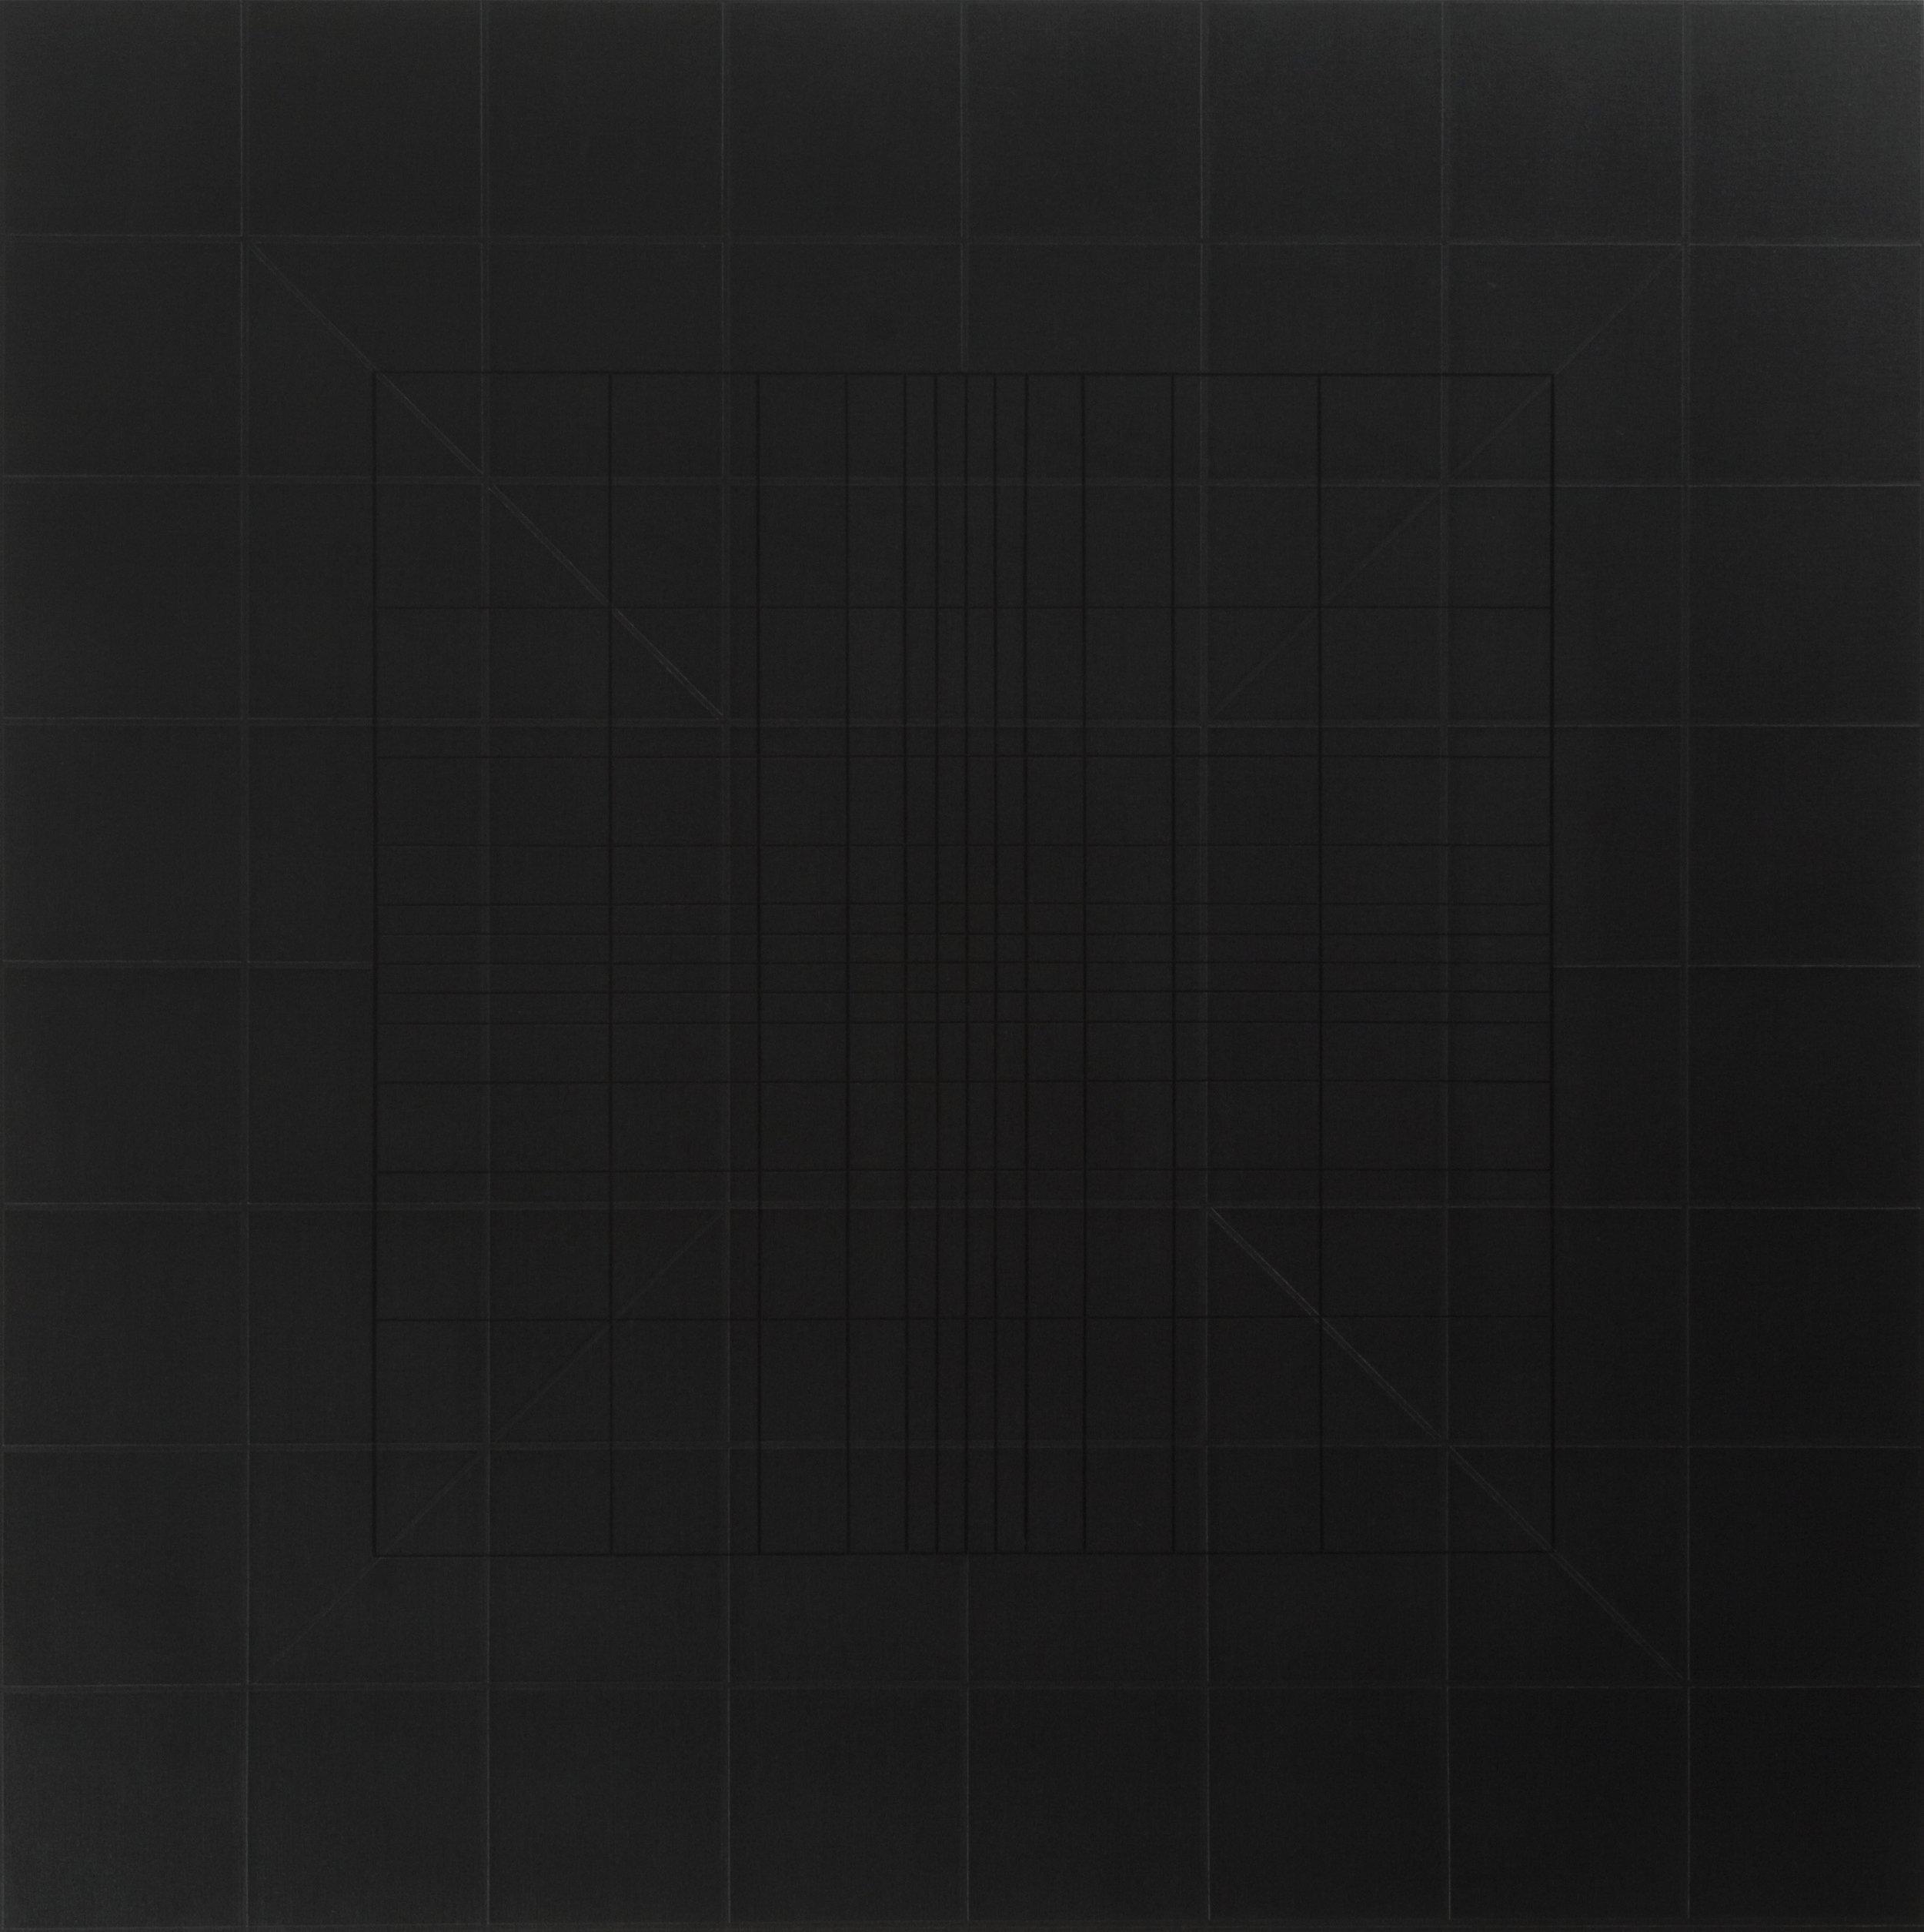 Yantra-ipsum-arkhē(1)2011.Feb, acrylic on canvas, 35 7/16 x 35 7/16 in. [90x90cm]